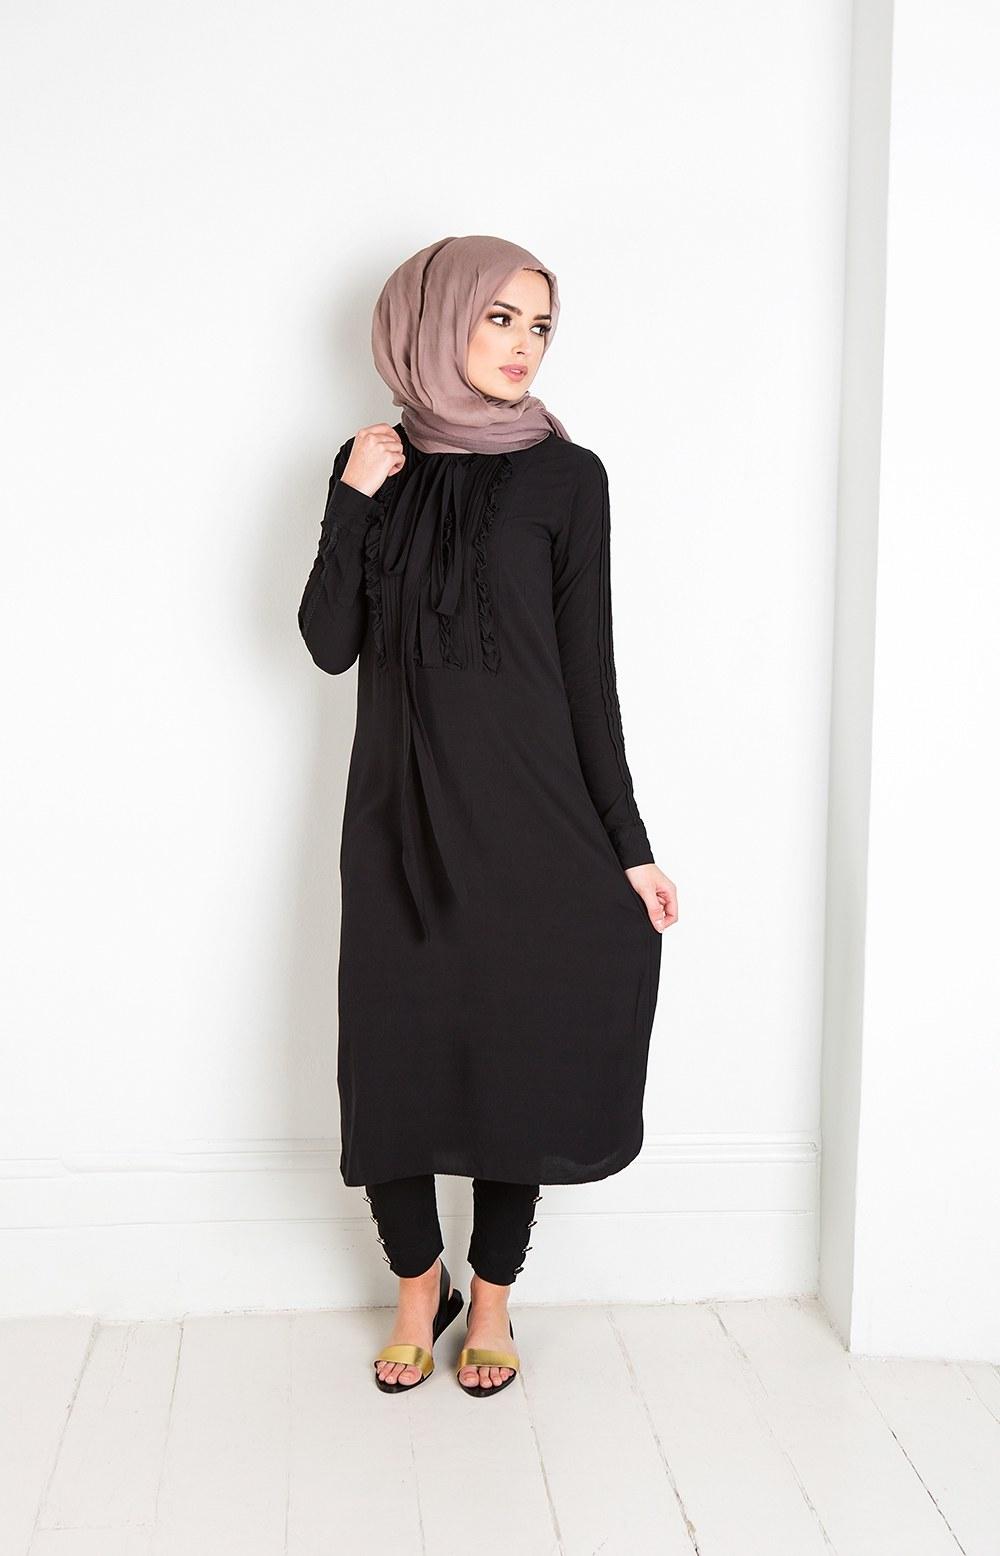 Design Baju Lebaran 2017 3ldq 25 Trend Model Baju Muslim Lebaran 2018 Simple & Modis